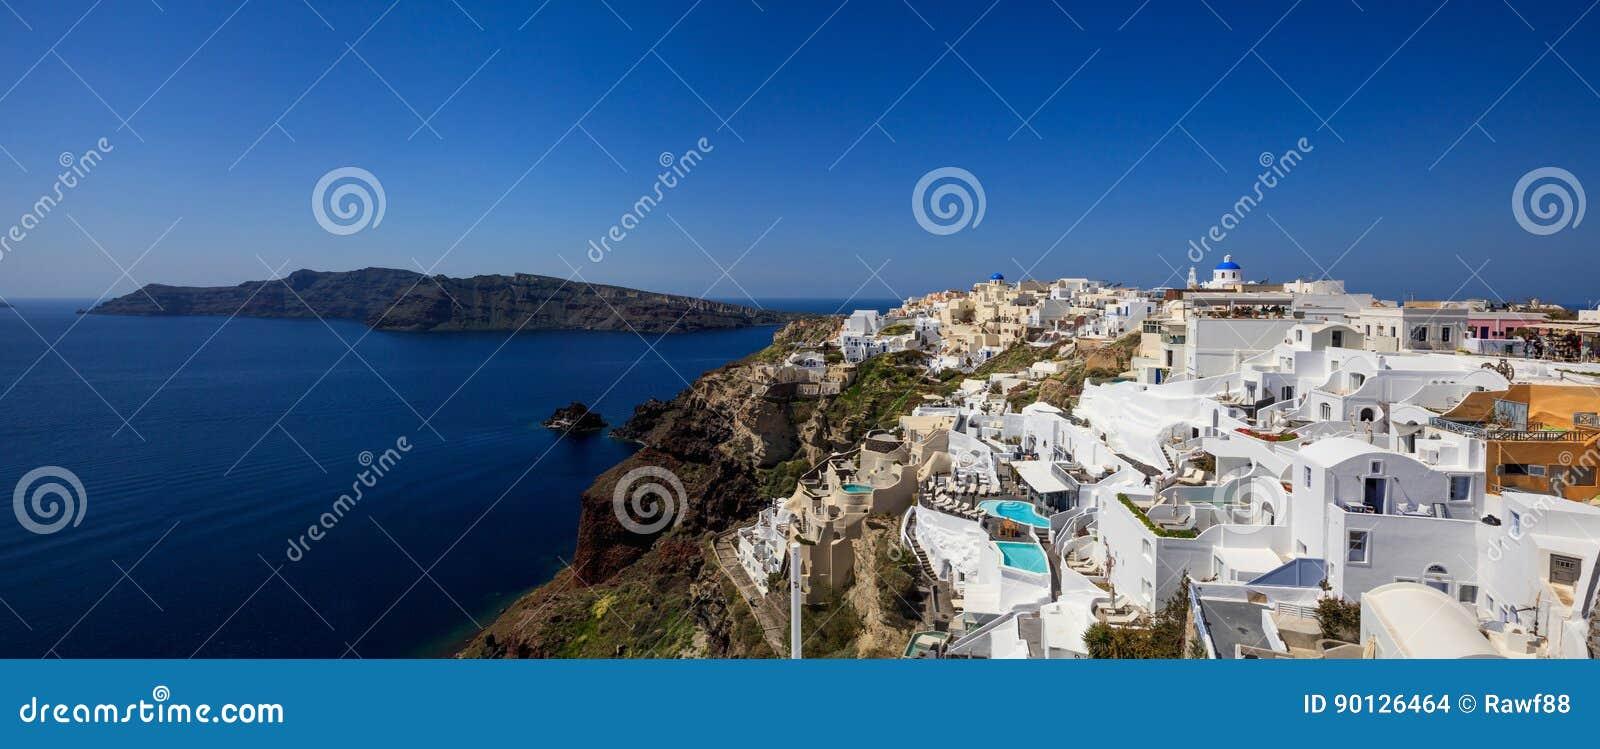 Santorini-Insel, Griechenland - Kessel über Ägäischem Meer